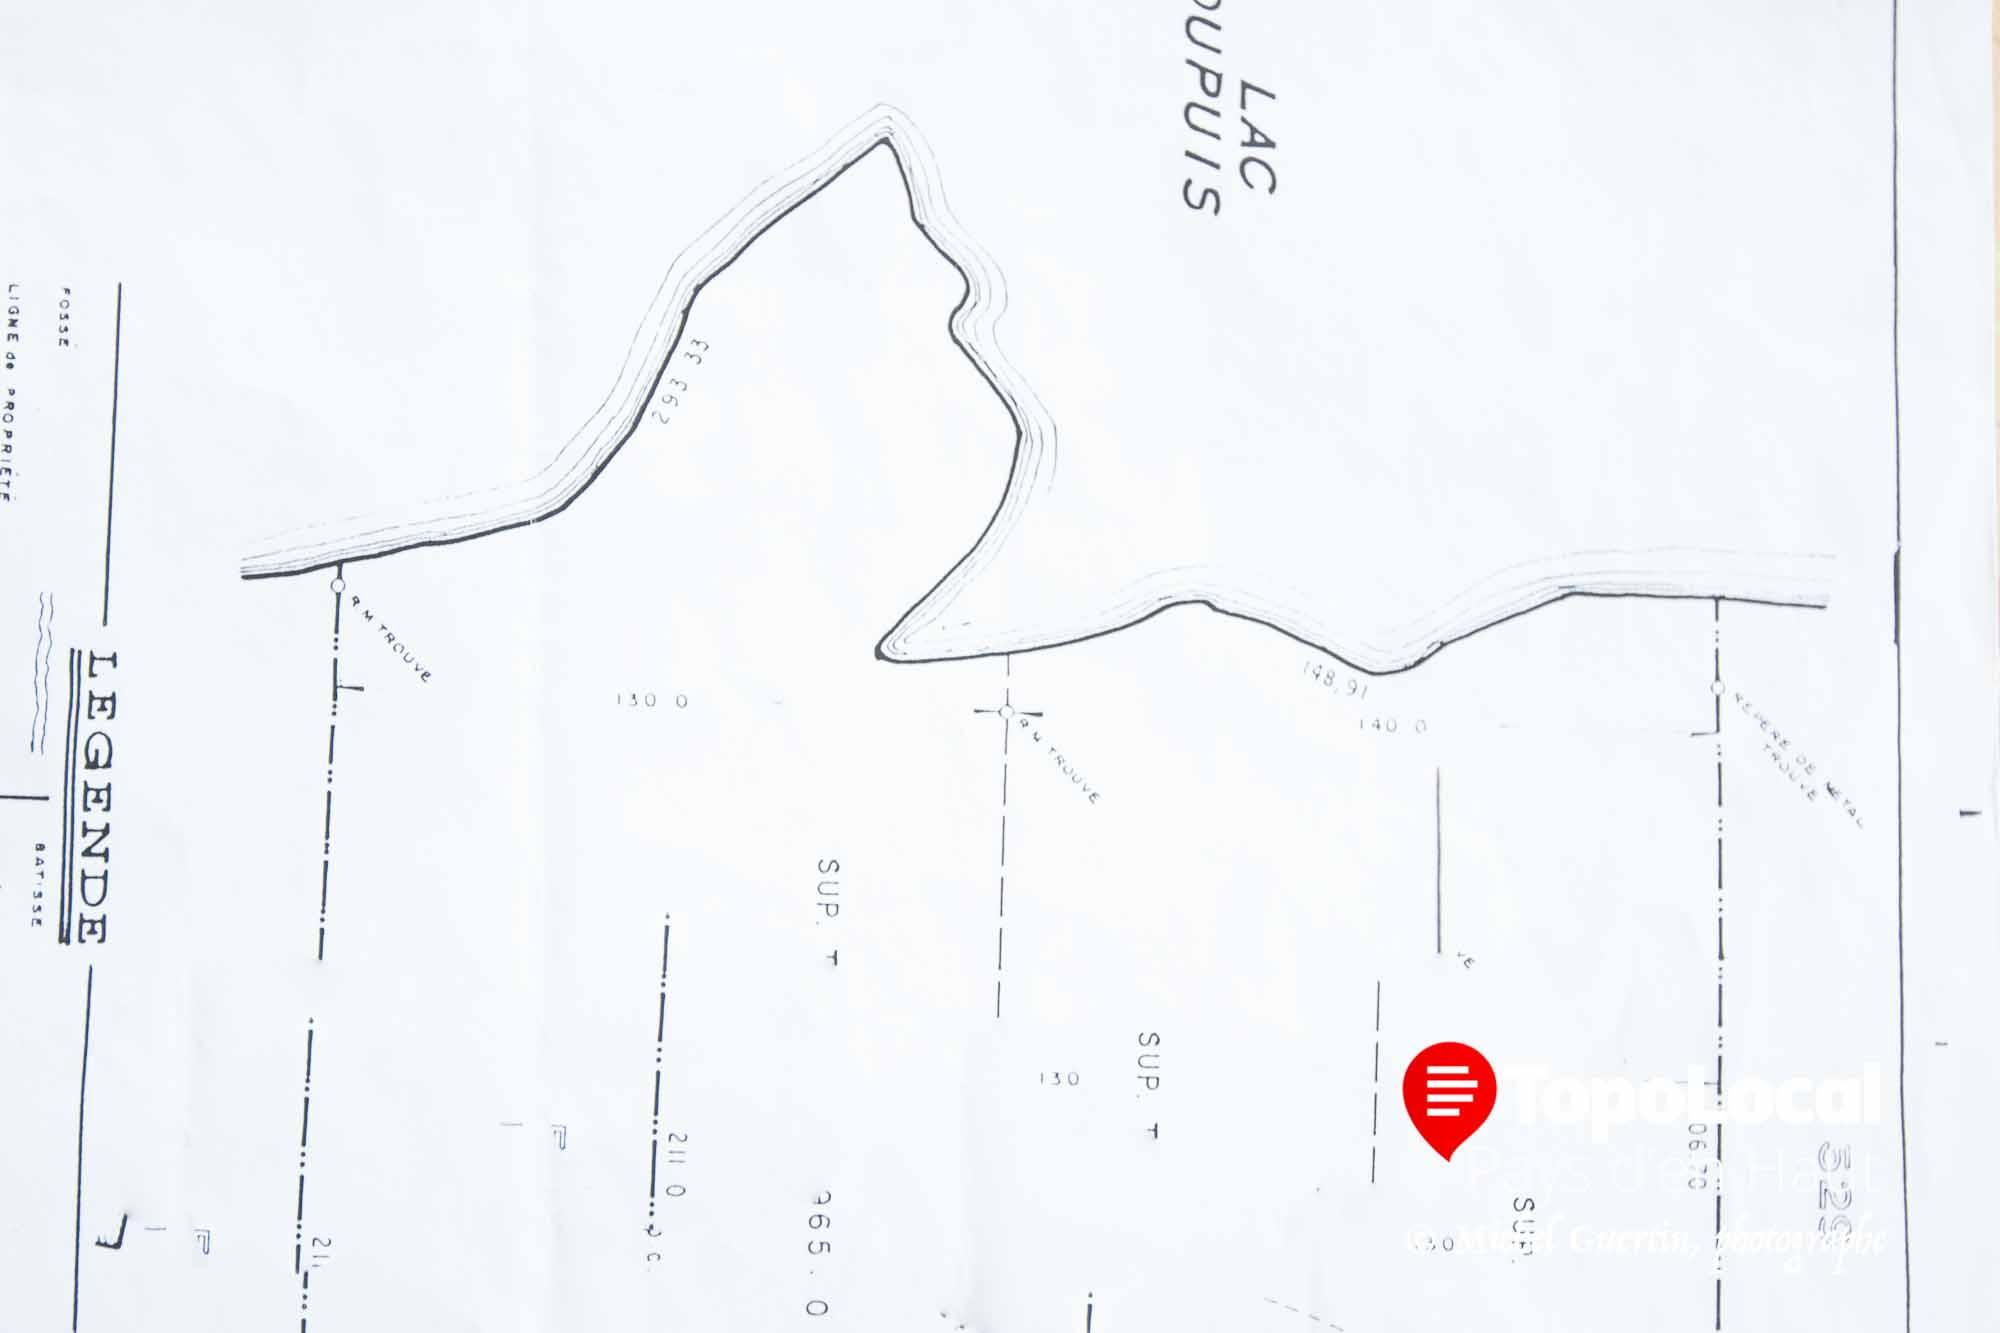 20160813-esterel-conflit-citoyens-bord-eau-cadastre-2